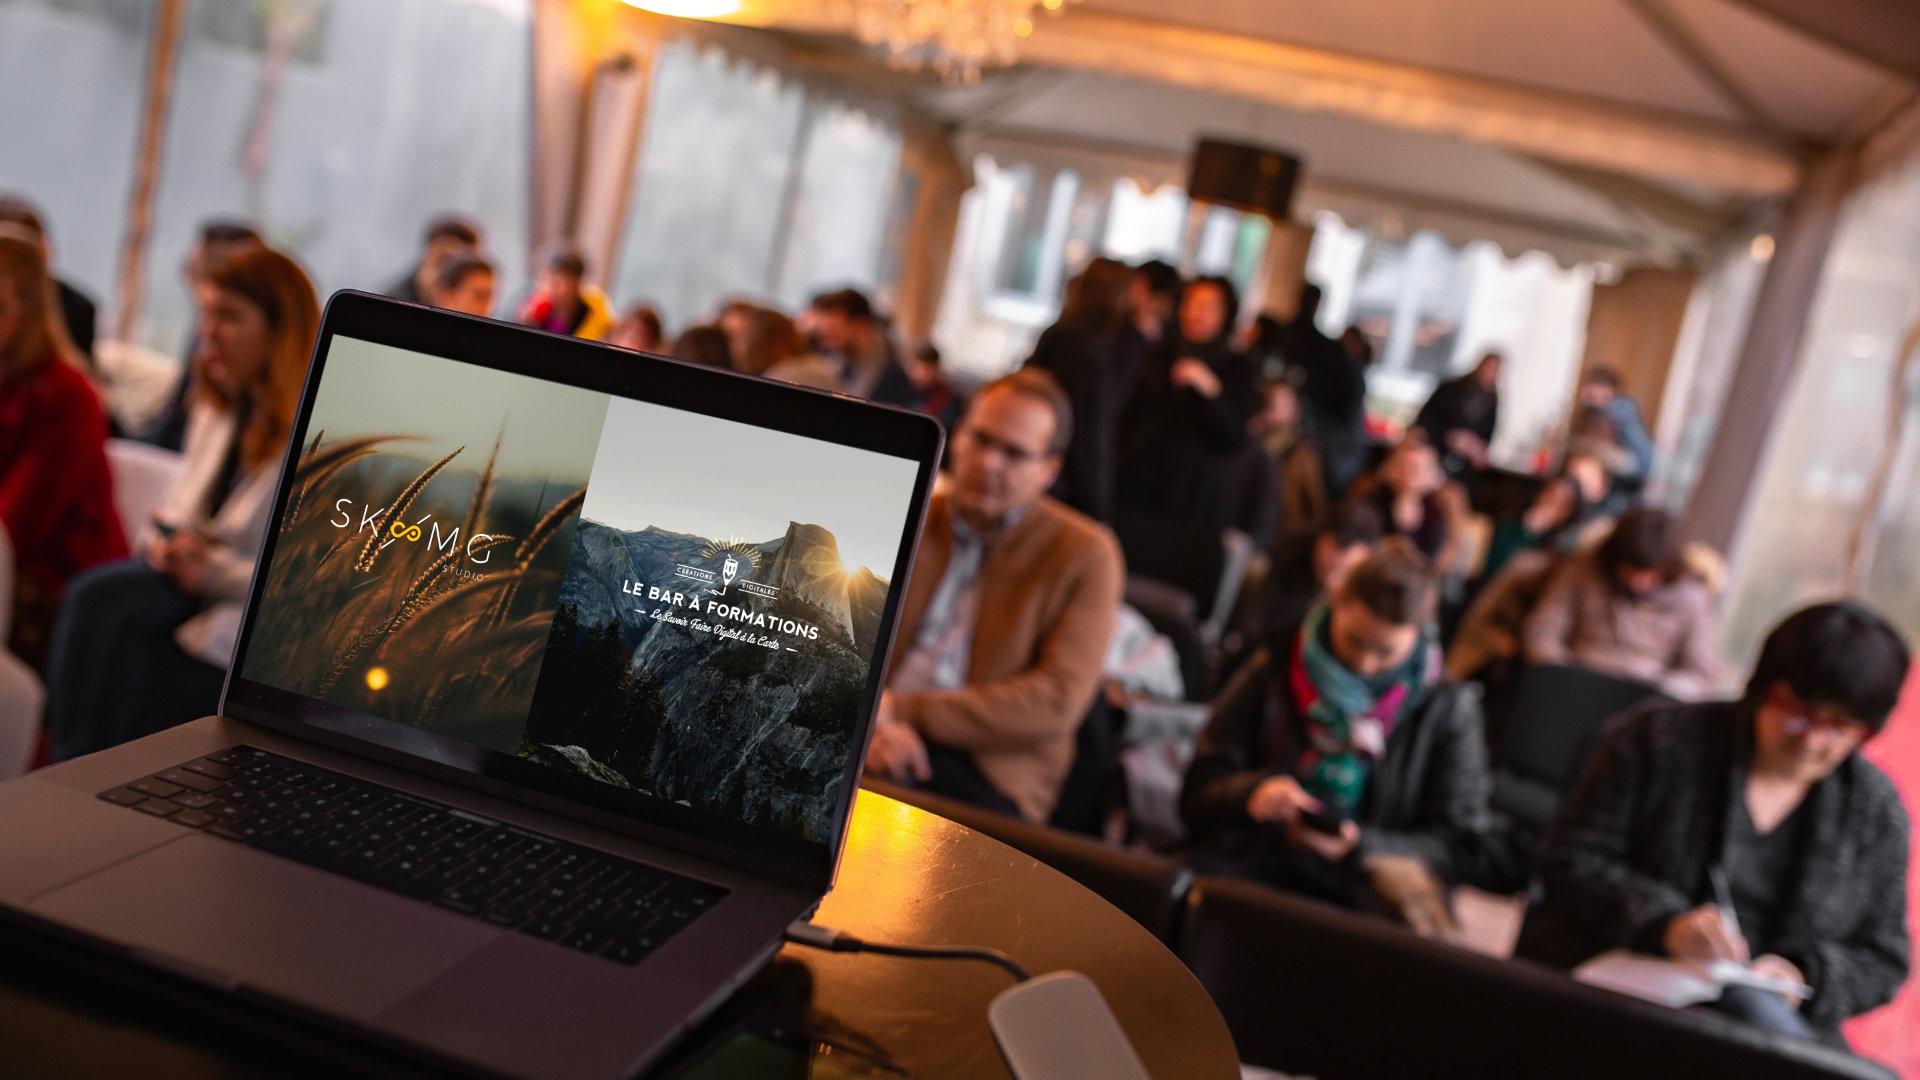 Winter Creative Party - Nantes. SKMG Studio & Le Bar à Formations